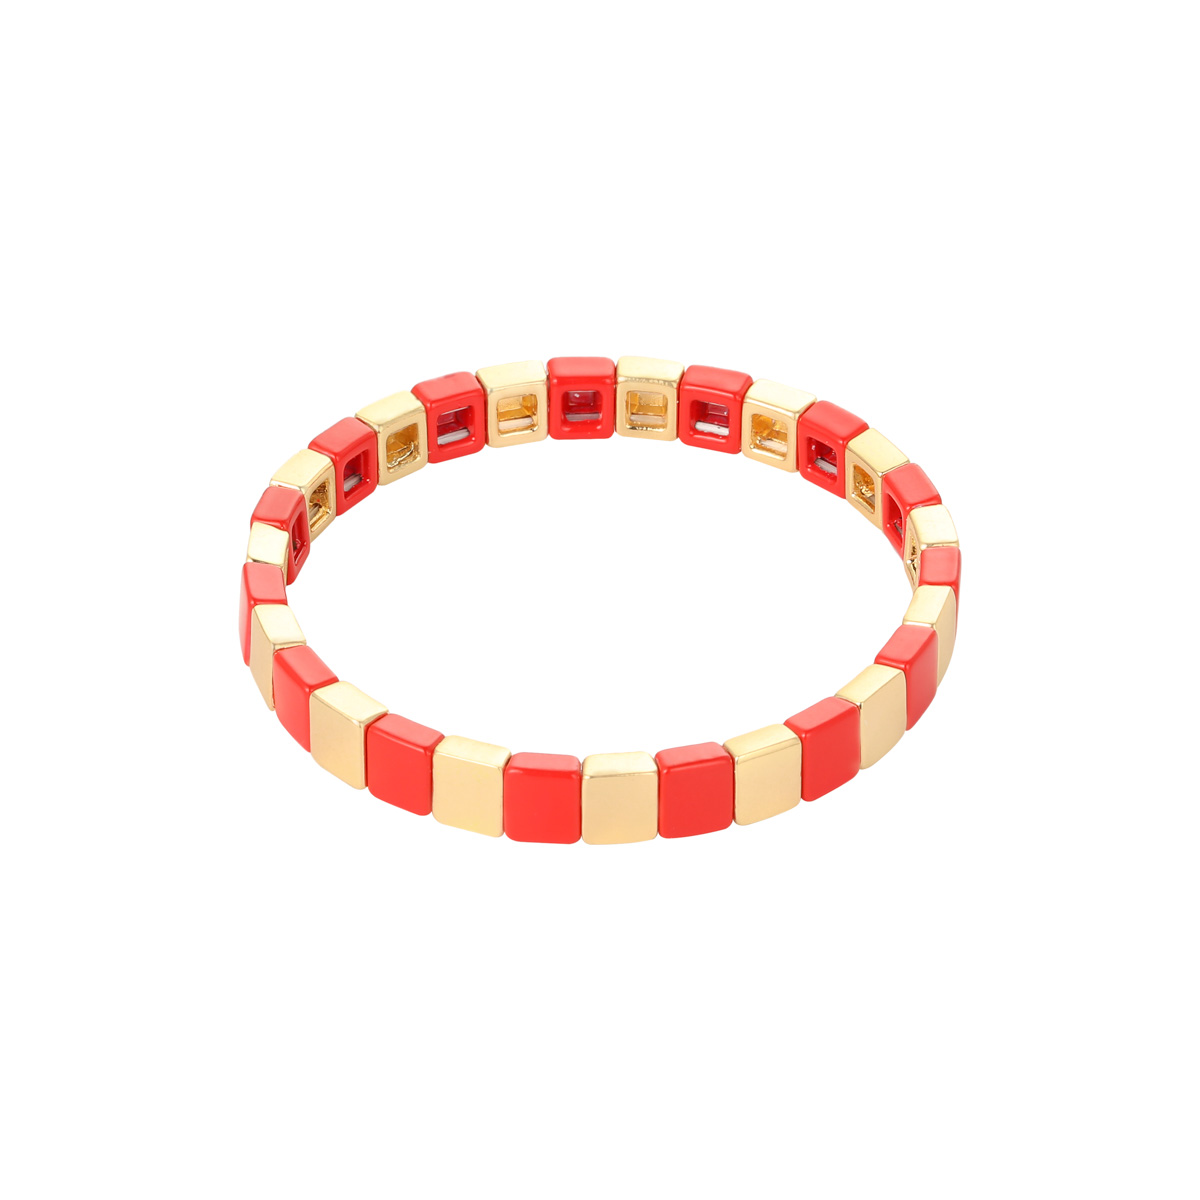 Bracelet Colored Bricks